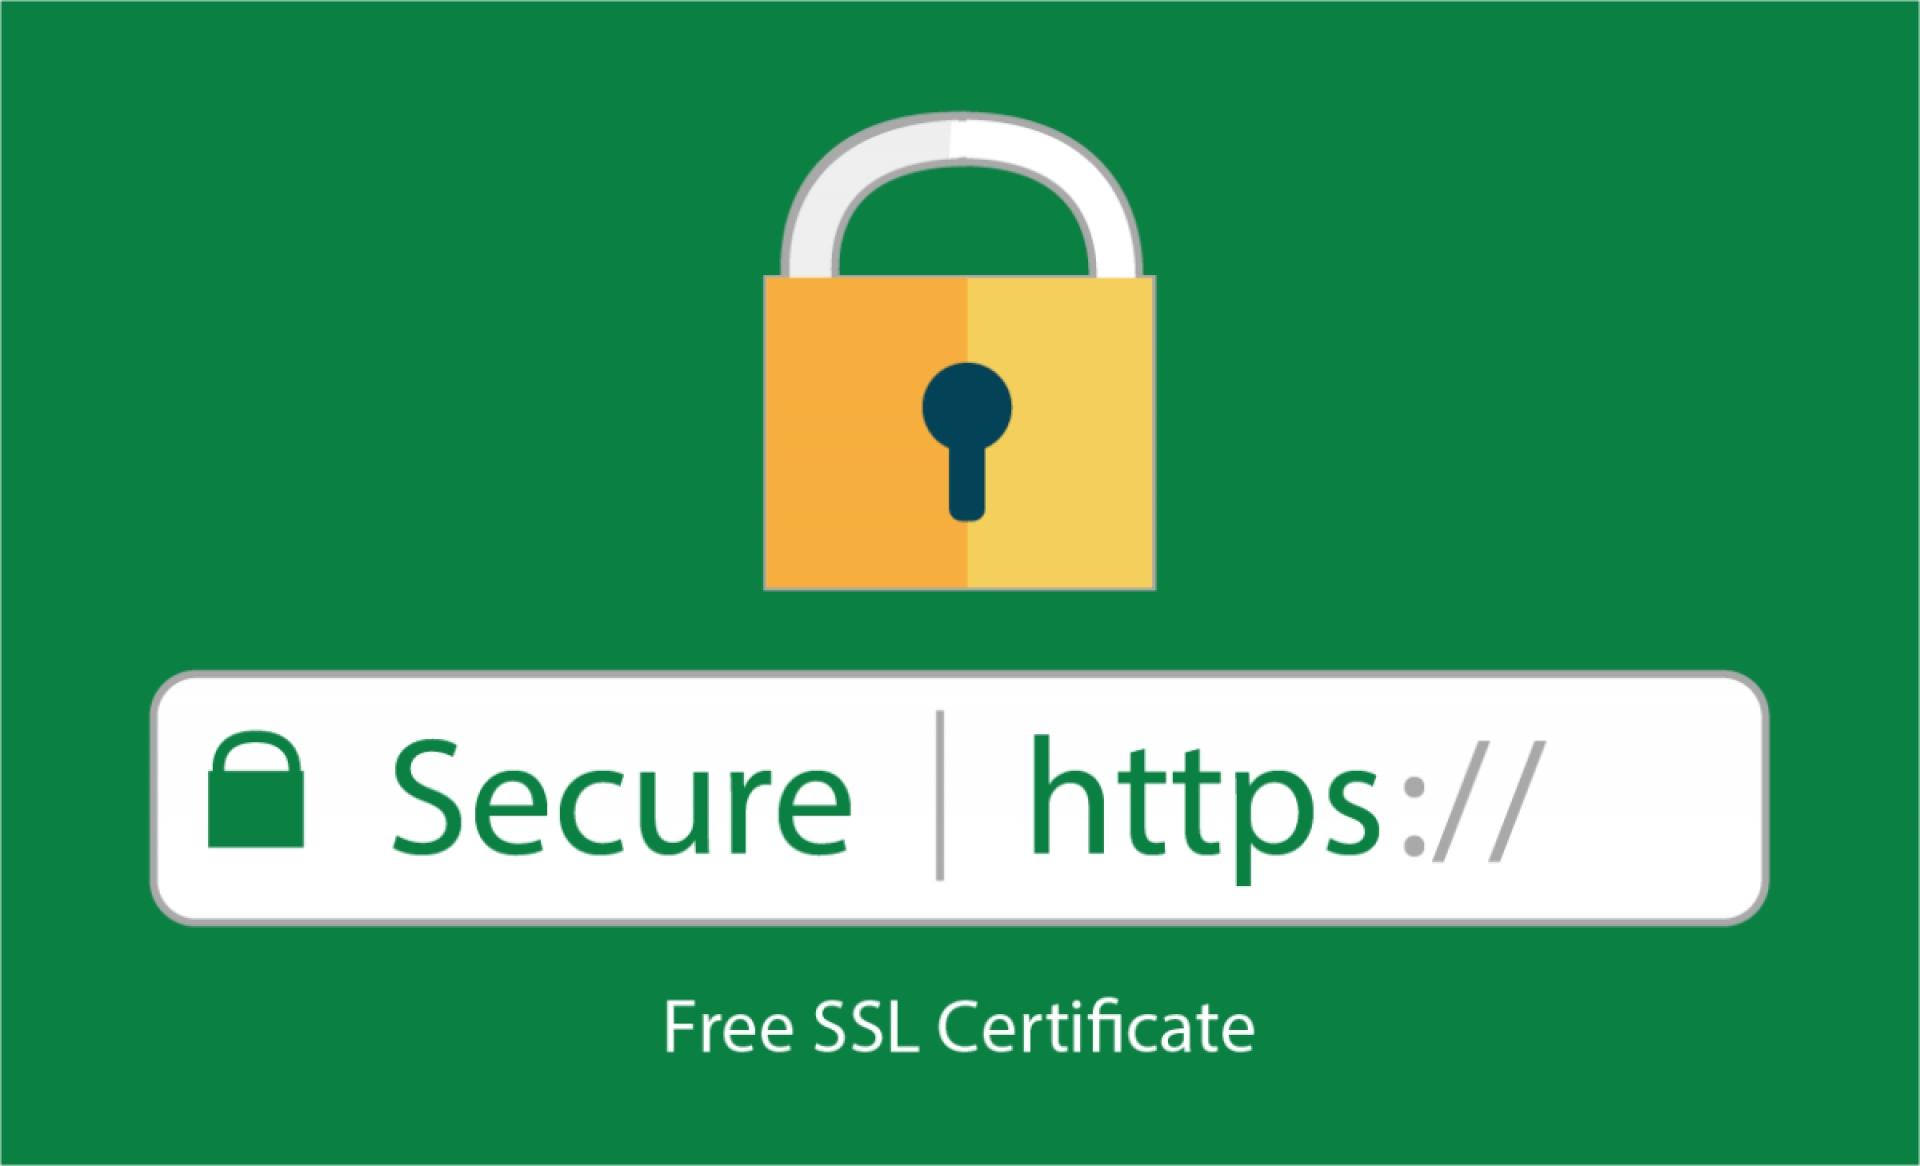 http mi yoksa https mi? SSL nedir? Ne işe yarar?